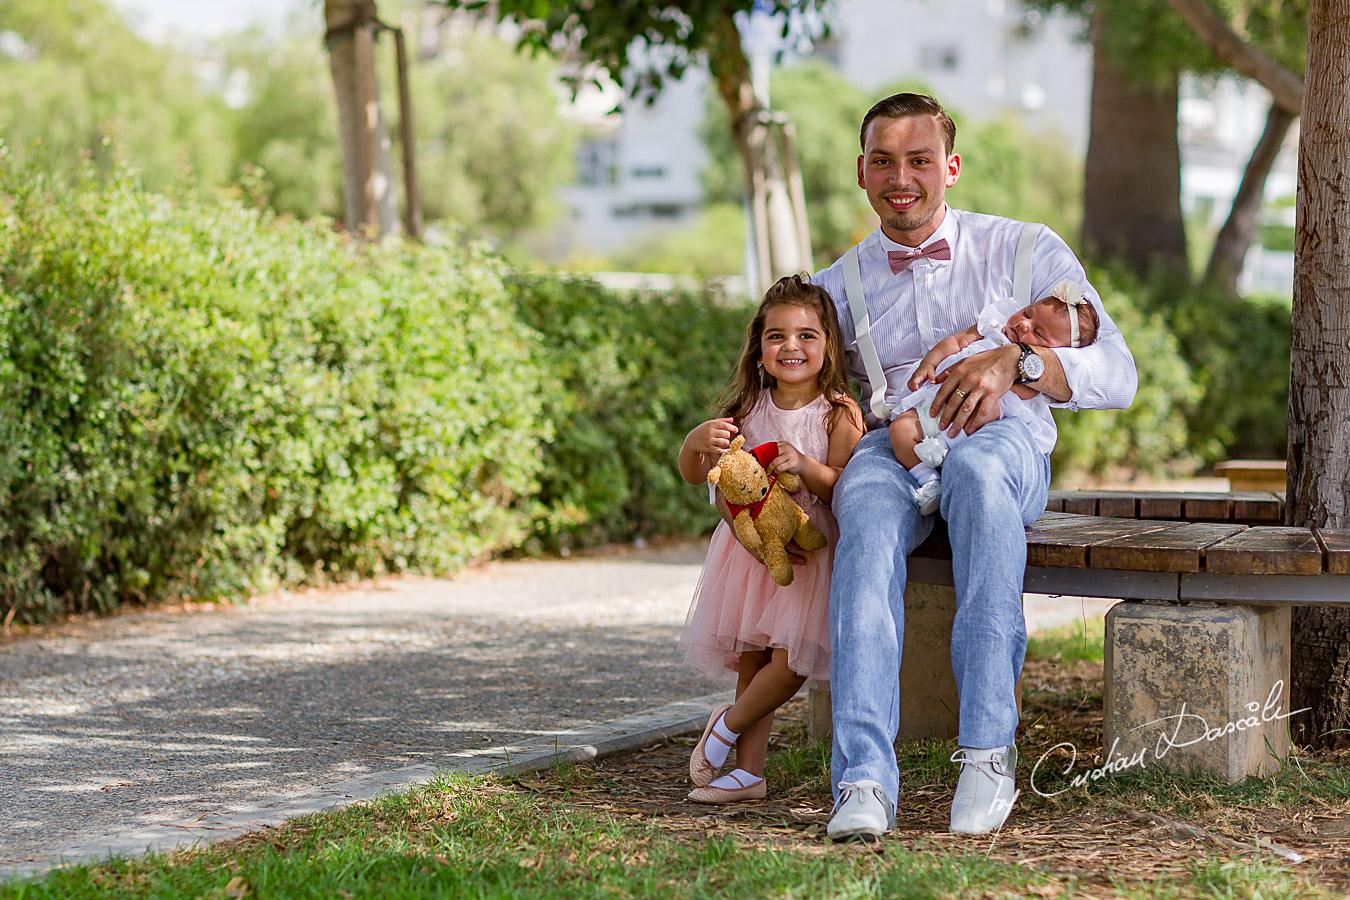 Angelic Christening in Limassol - 03